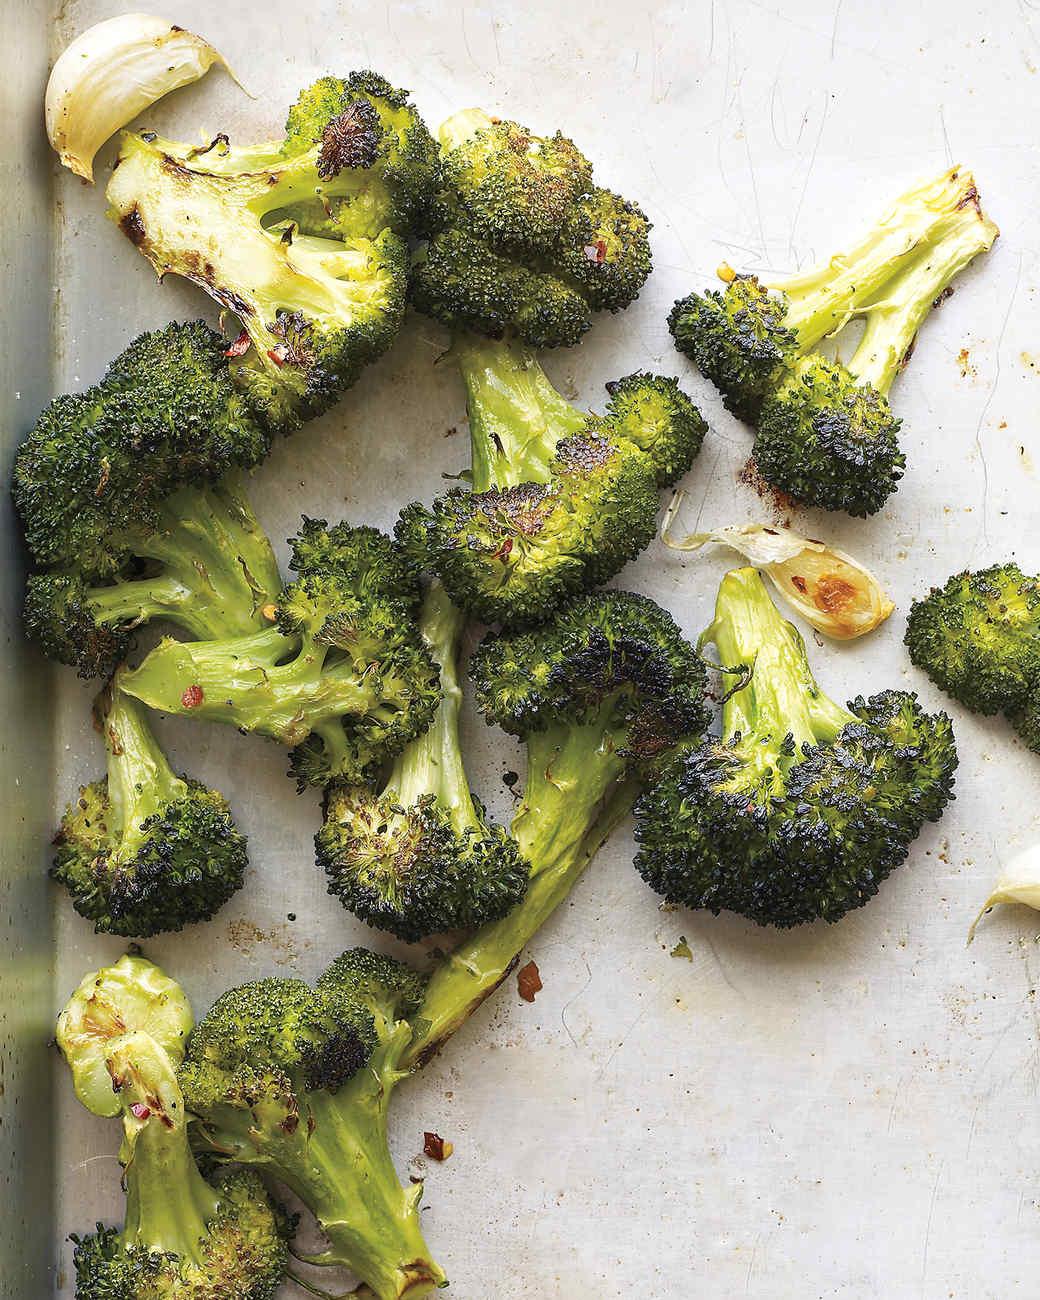 med105199_0310_rosted_broccoli.jpg